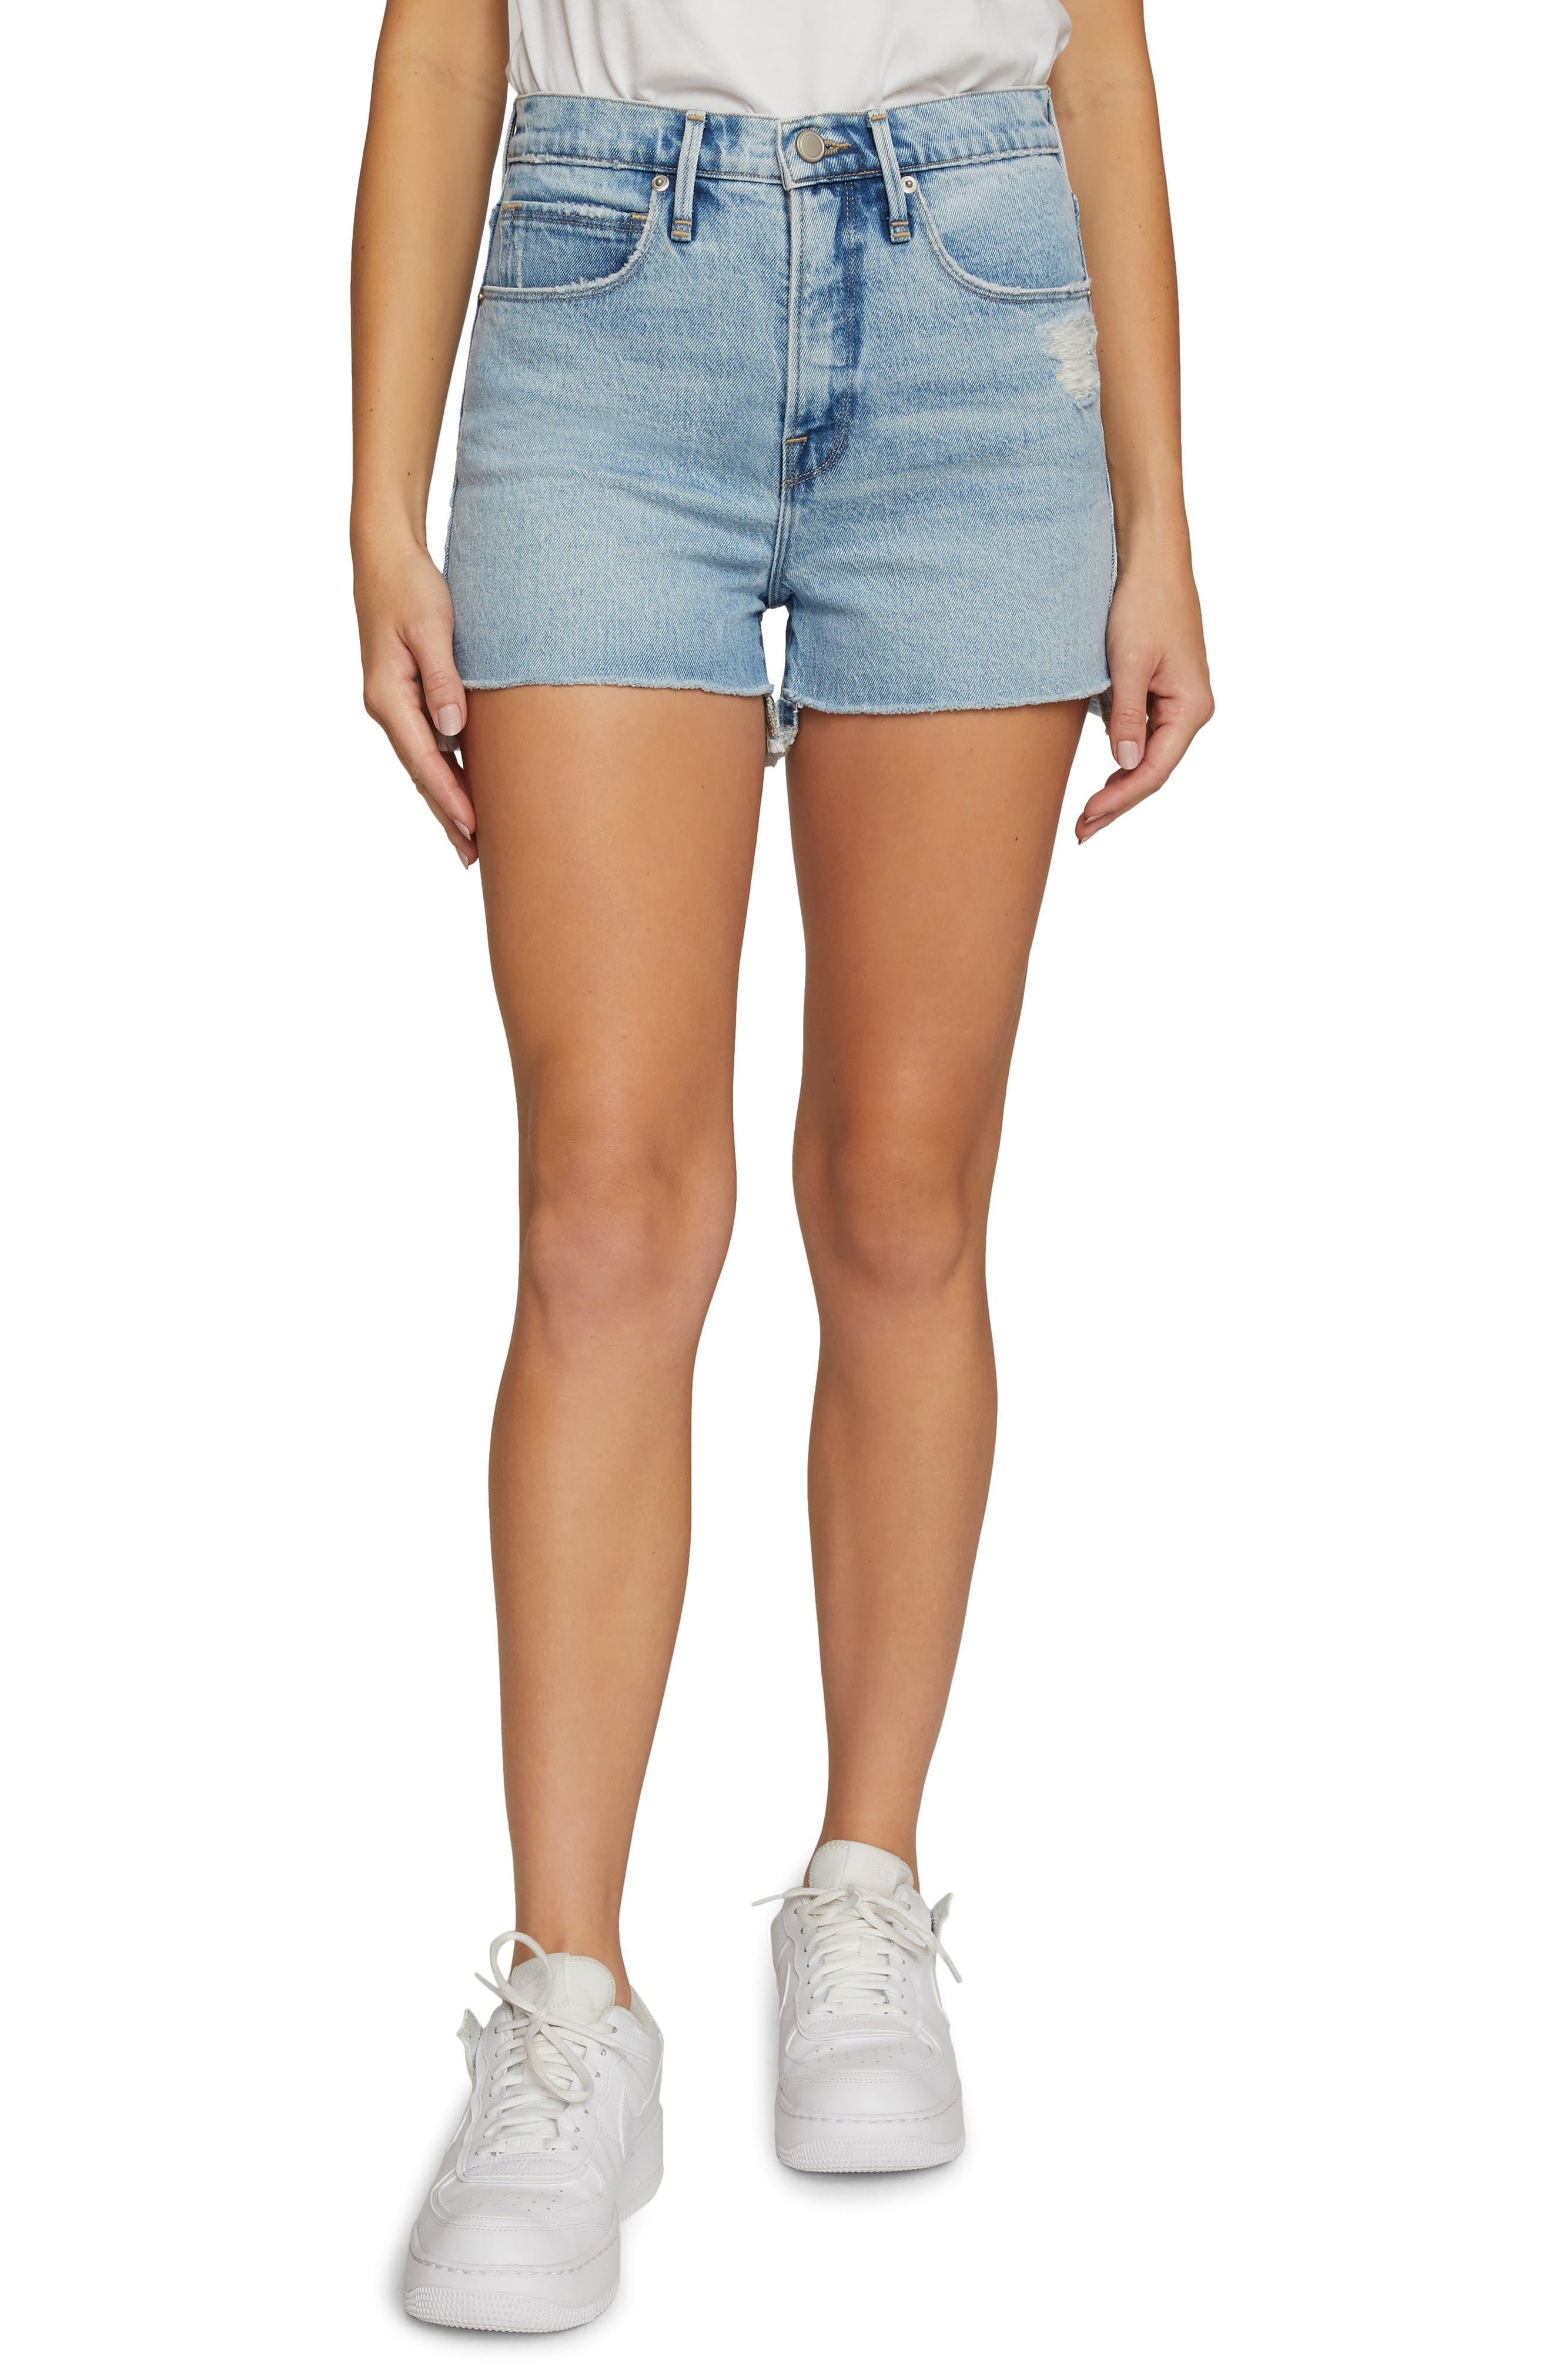 Good '90S Cutoff Denim Shorts